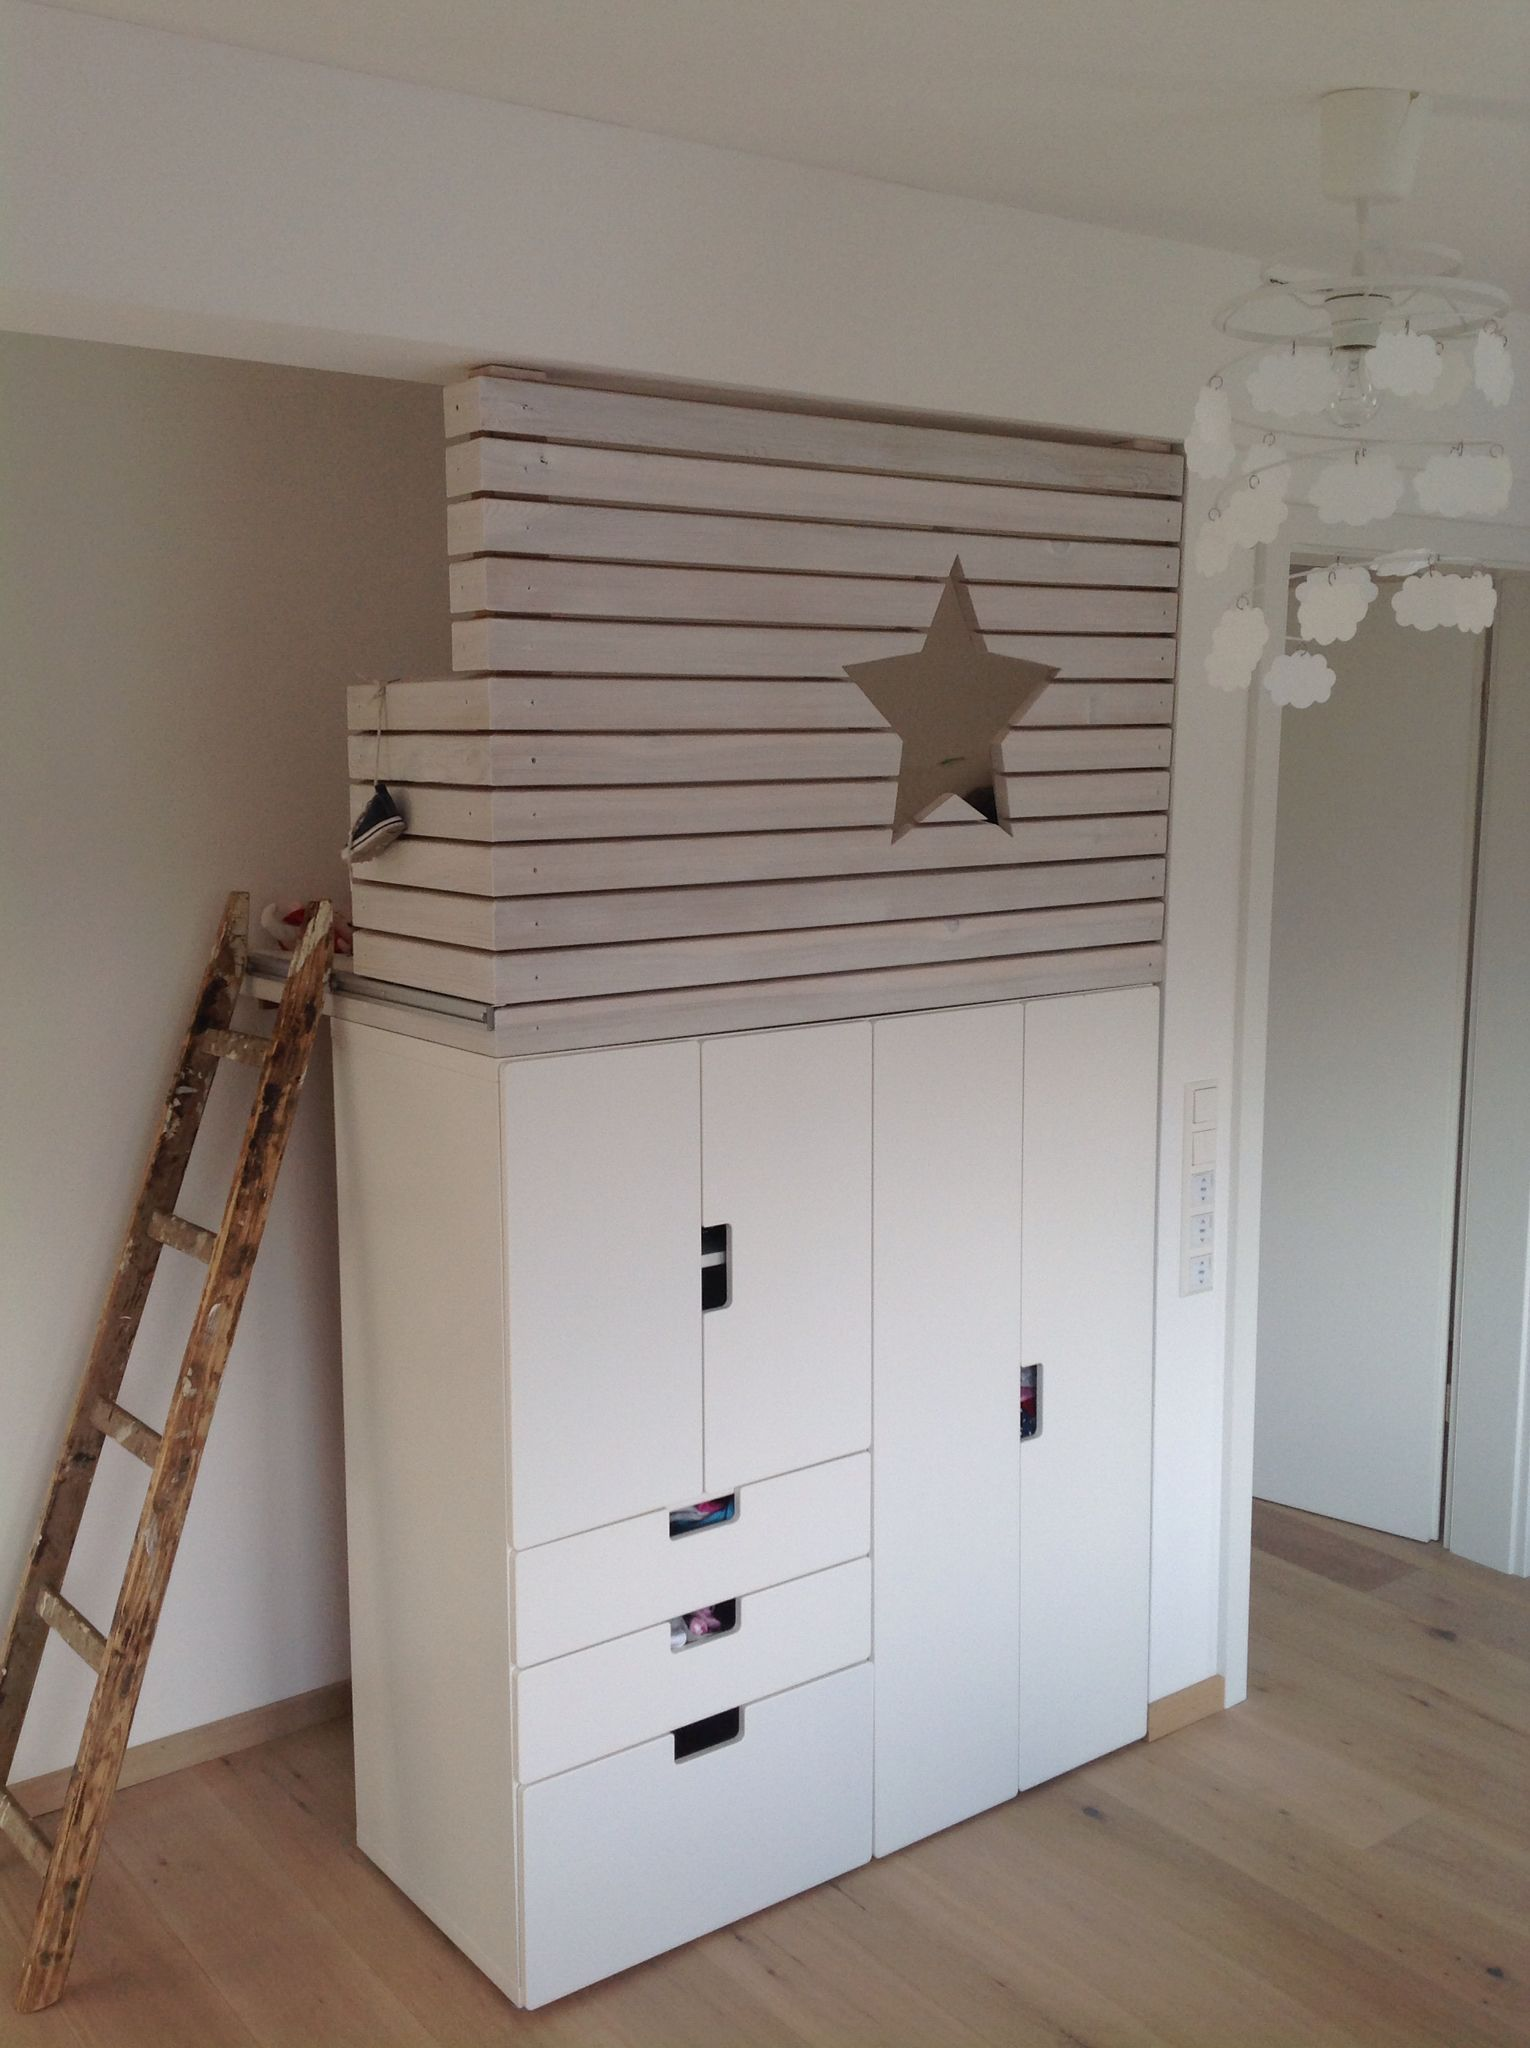 Kuschelecke Ikea